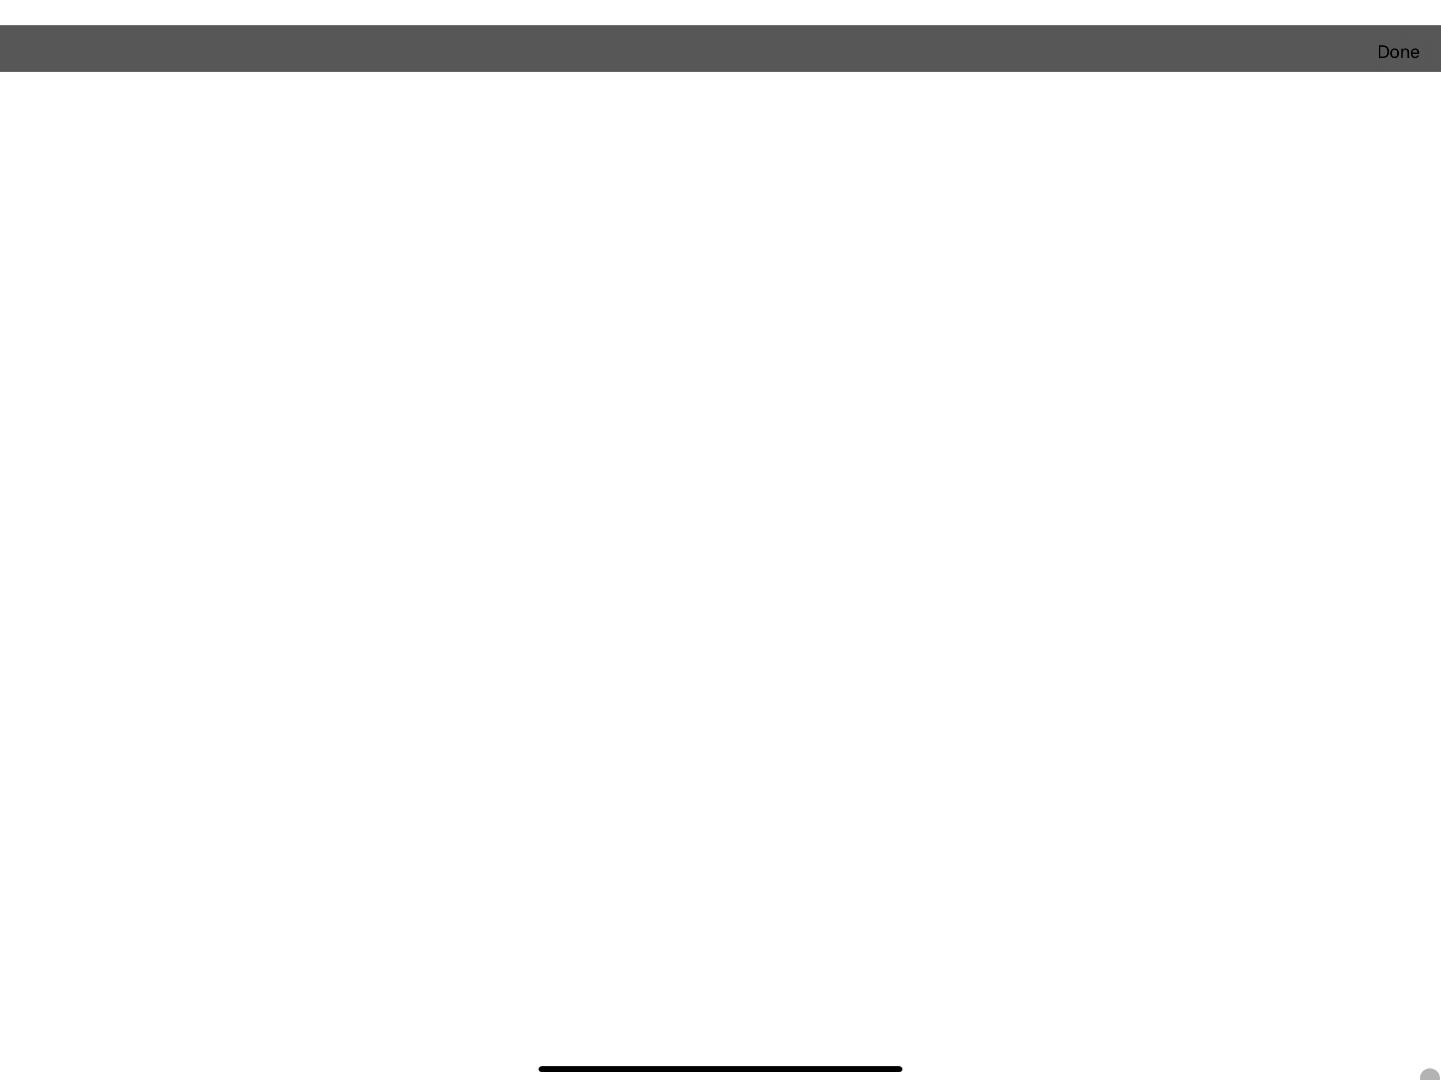 thebrain 11.0.5 - help blank.png